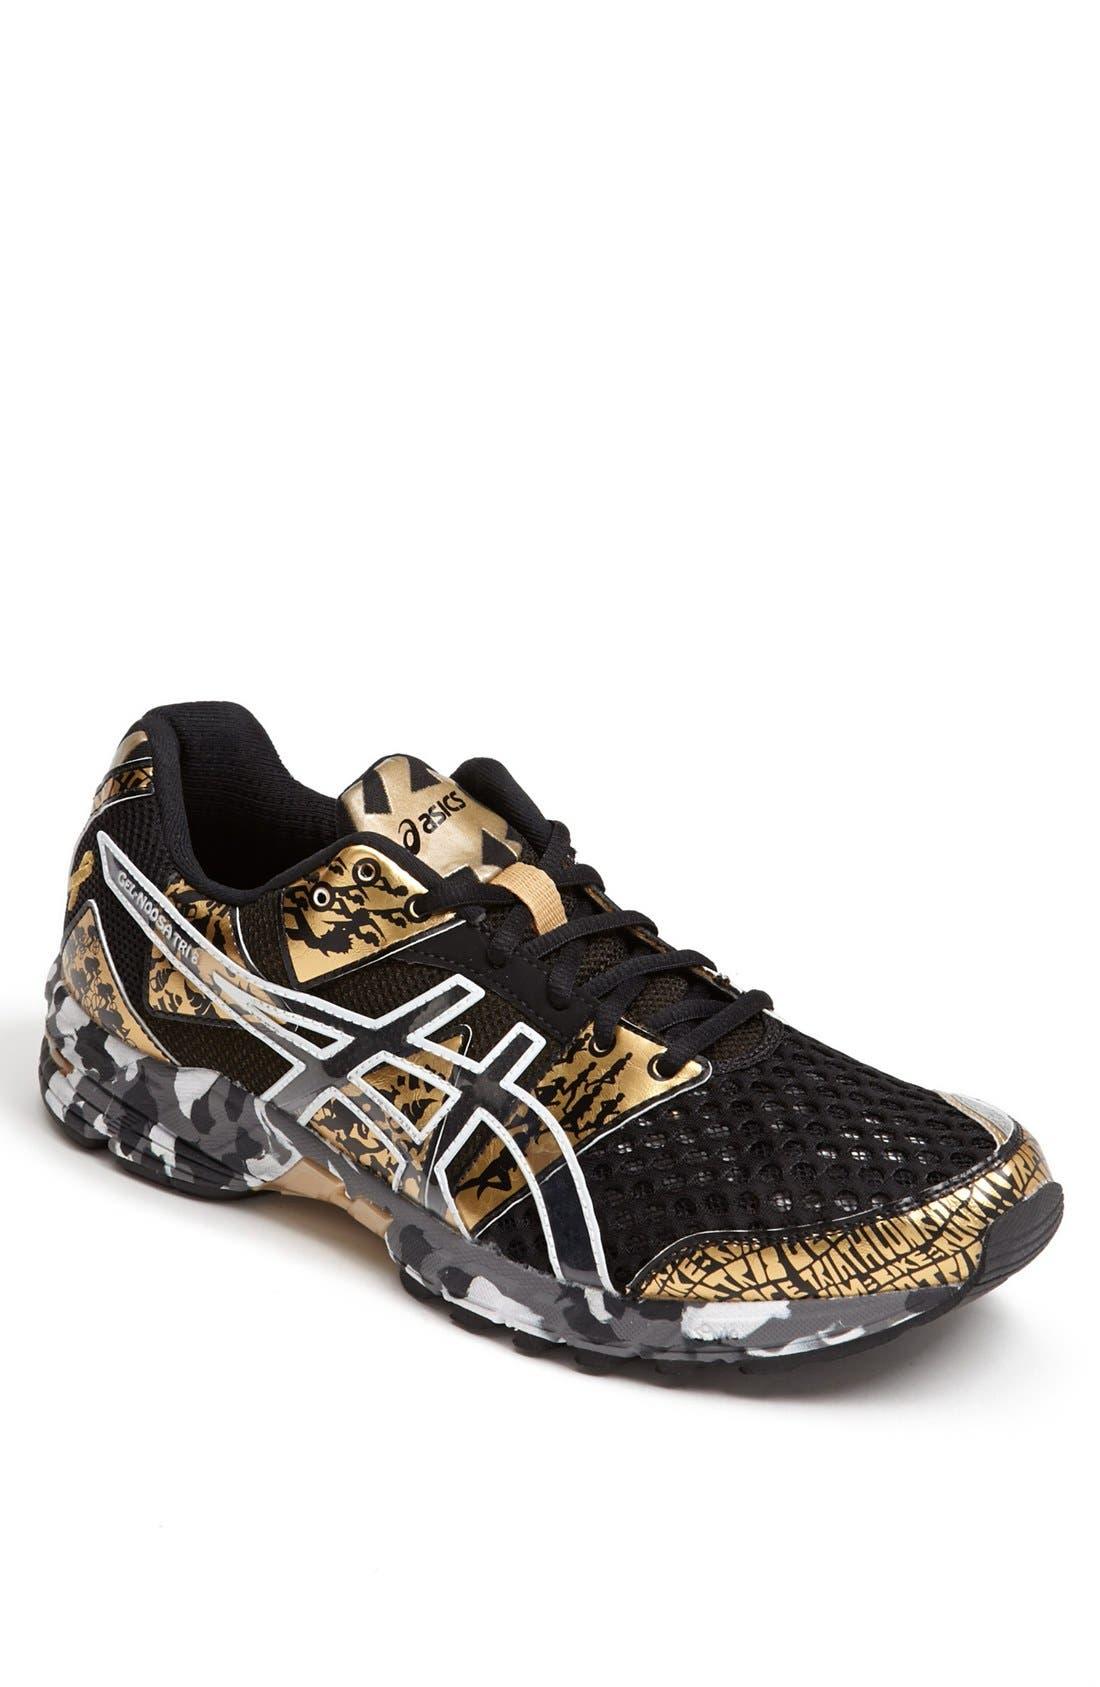 Alternate Image 1 Selected - ASICS® 'GEL-Noosa Tri 8 GR' Running Shoe (Men)